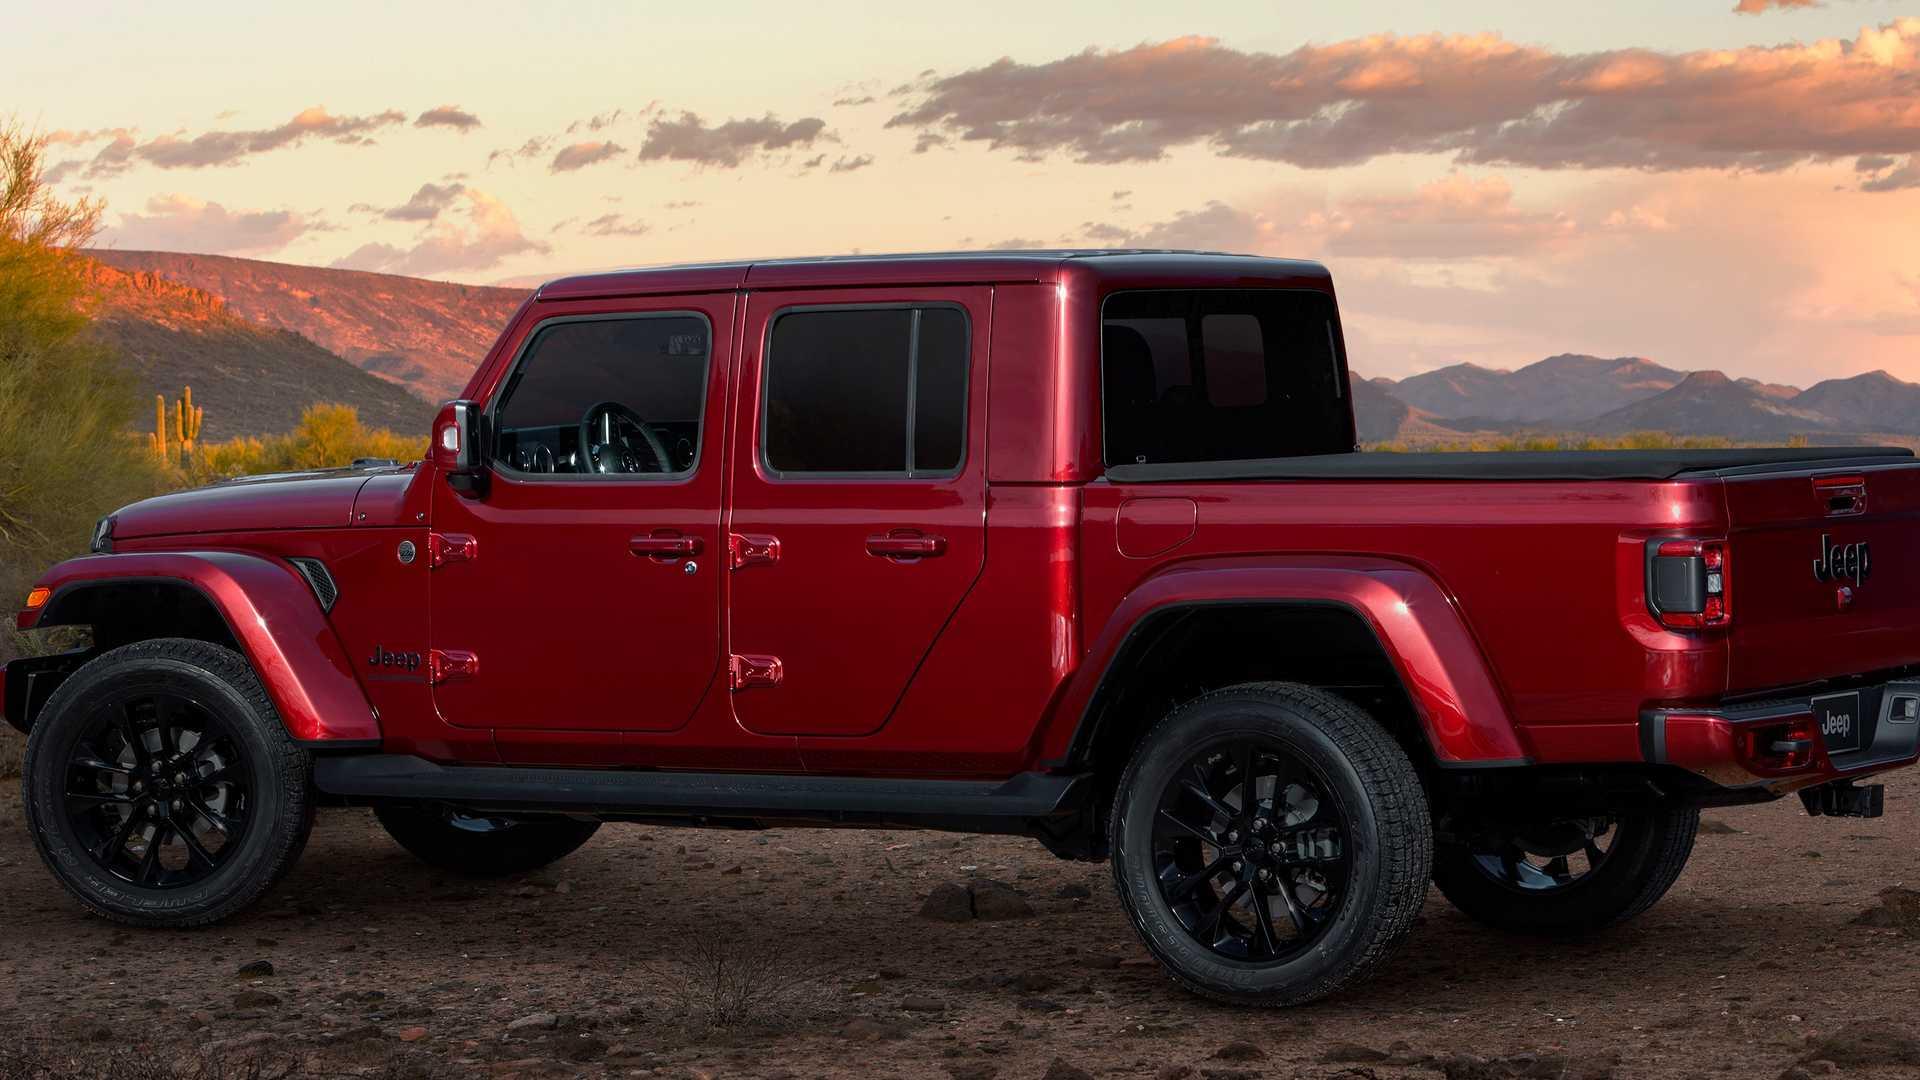 2020-jeep-gladiator-high-altitude-2